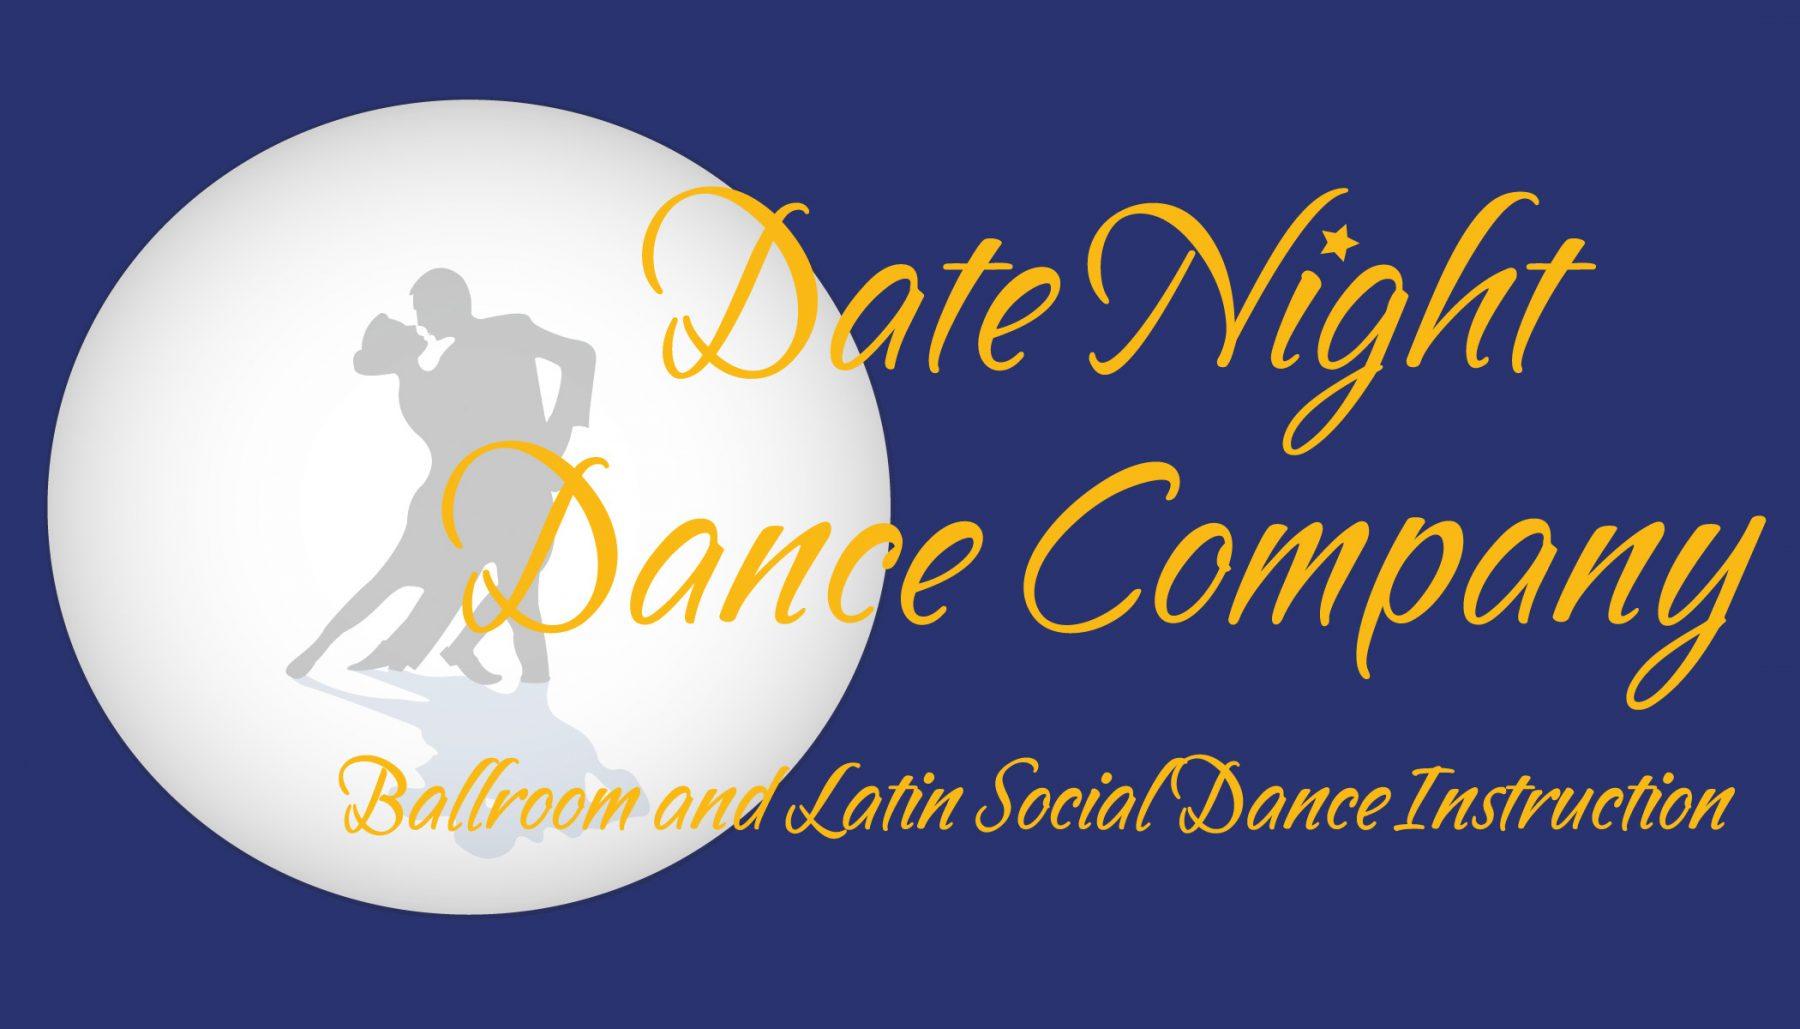 Date Night Dance Co. logo